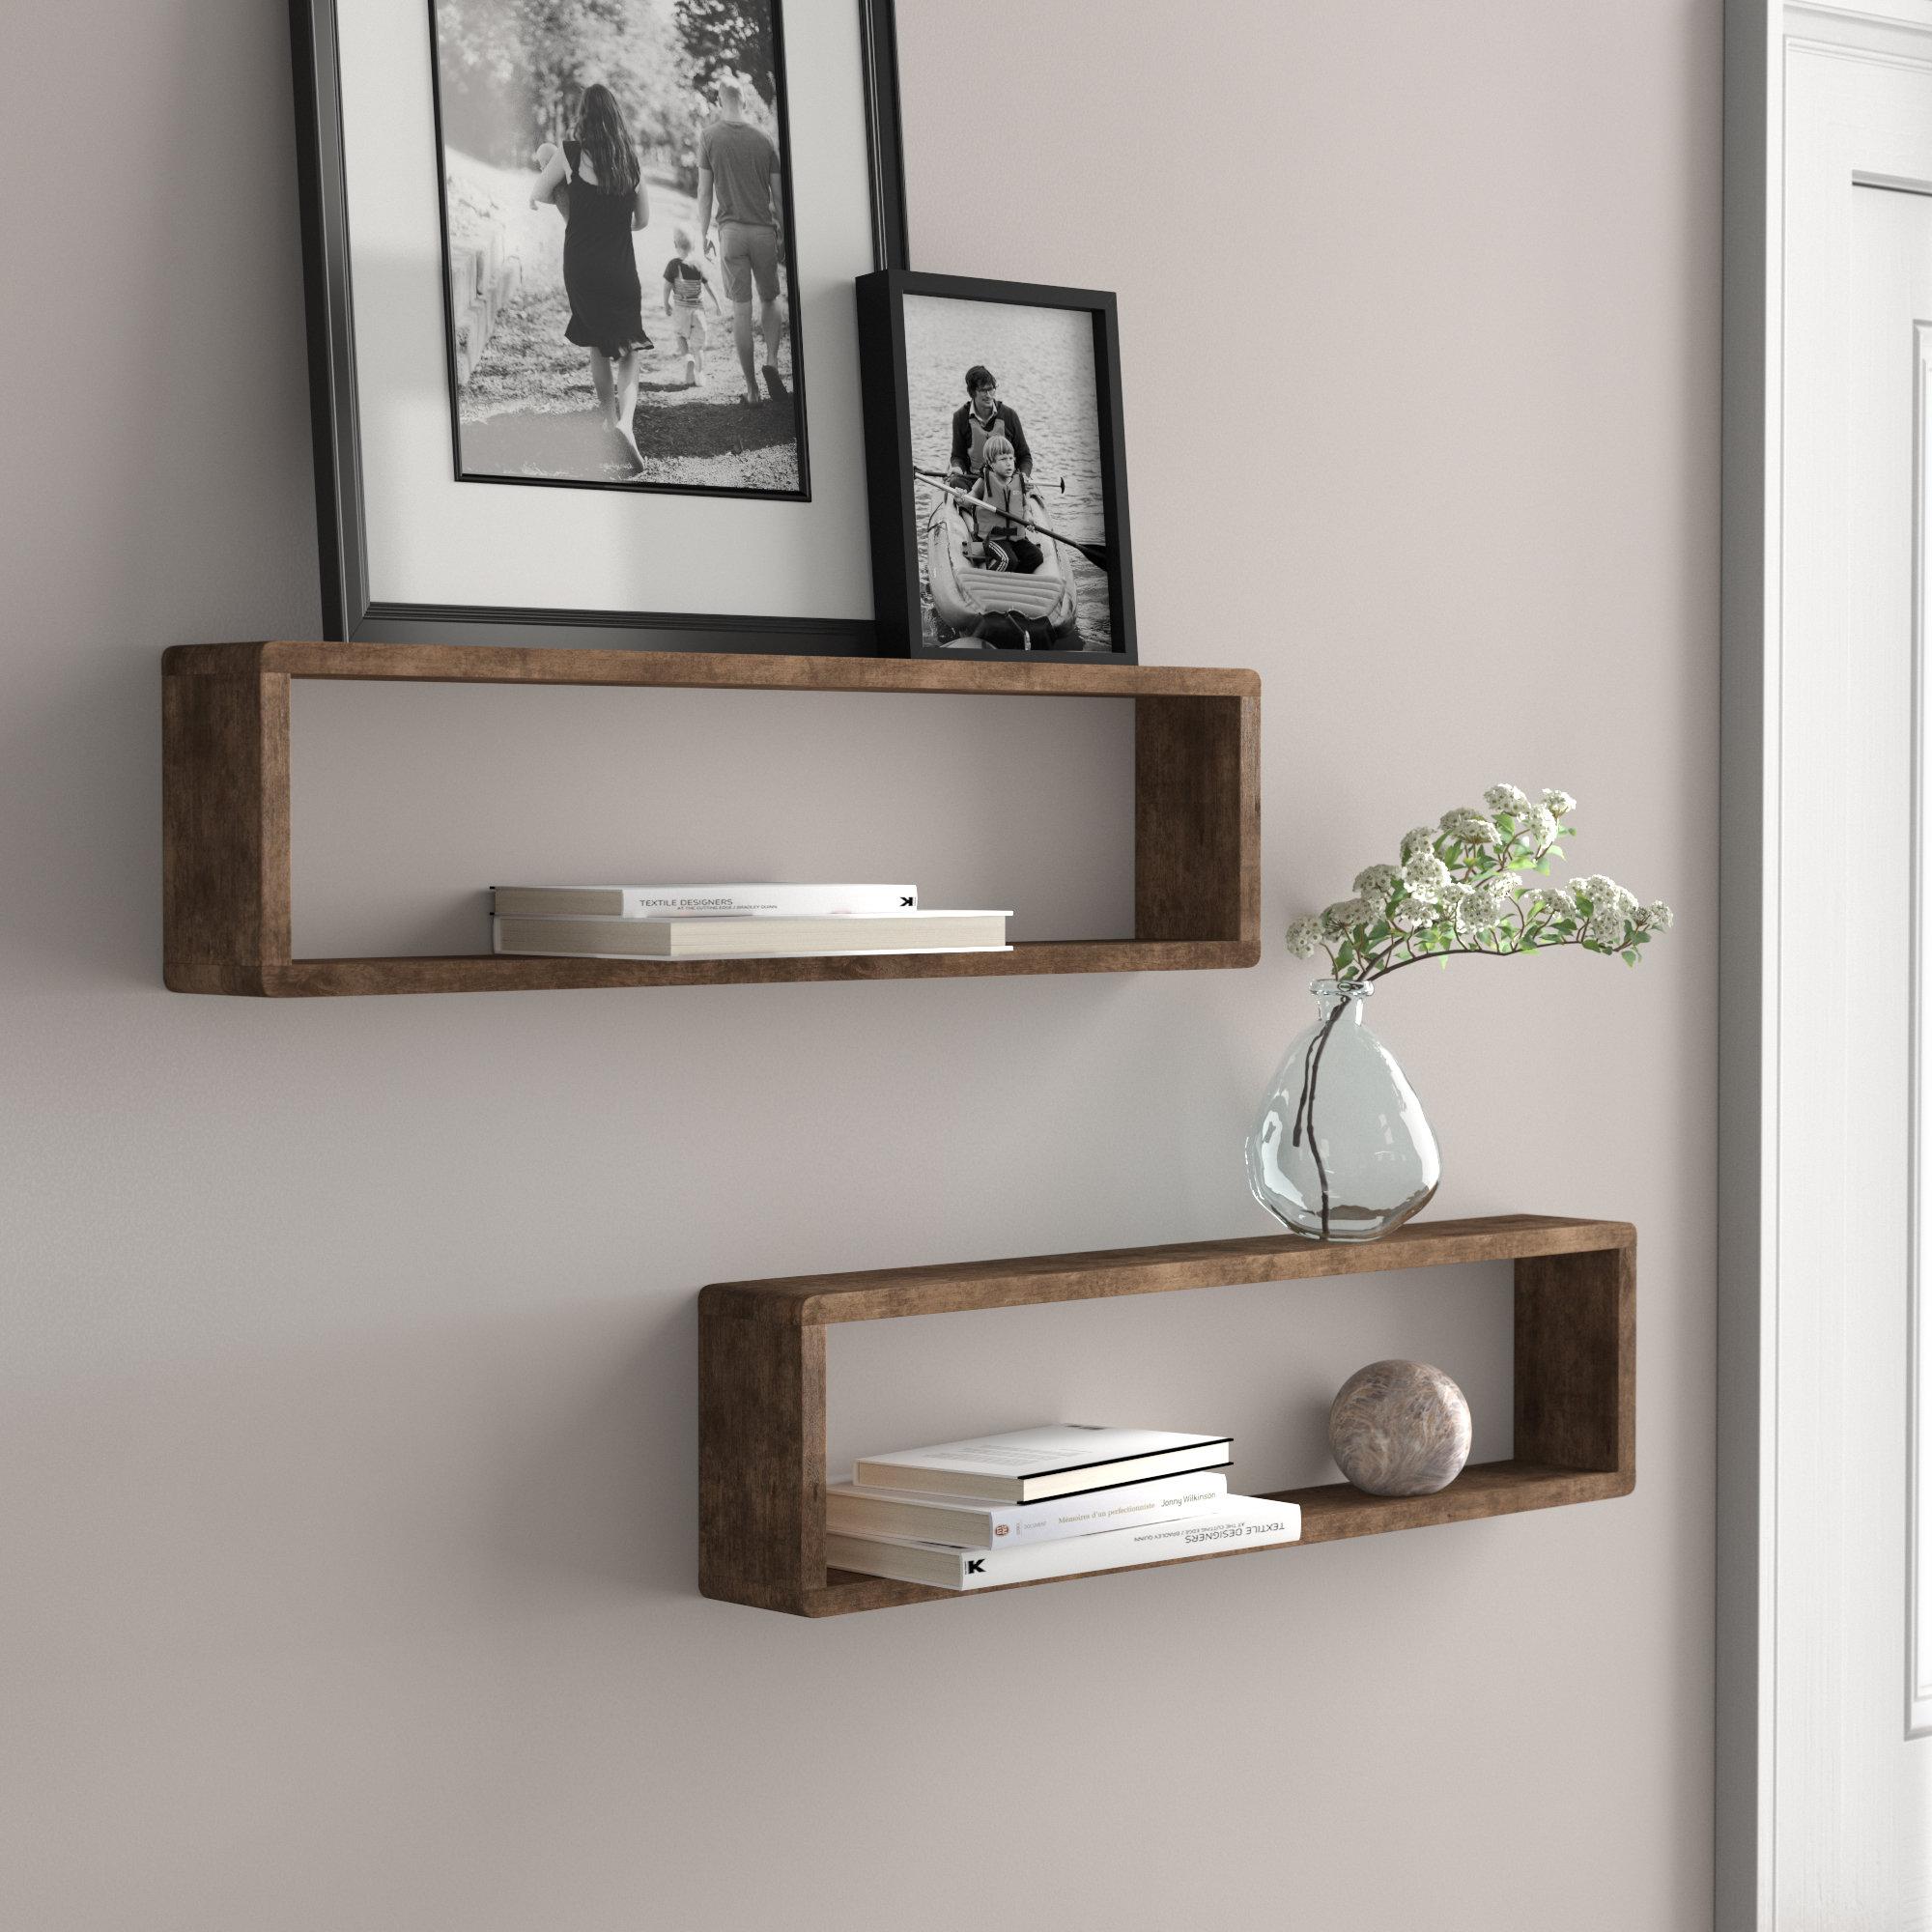 Bedroom Wall Display Shelves You Ll